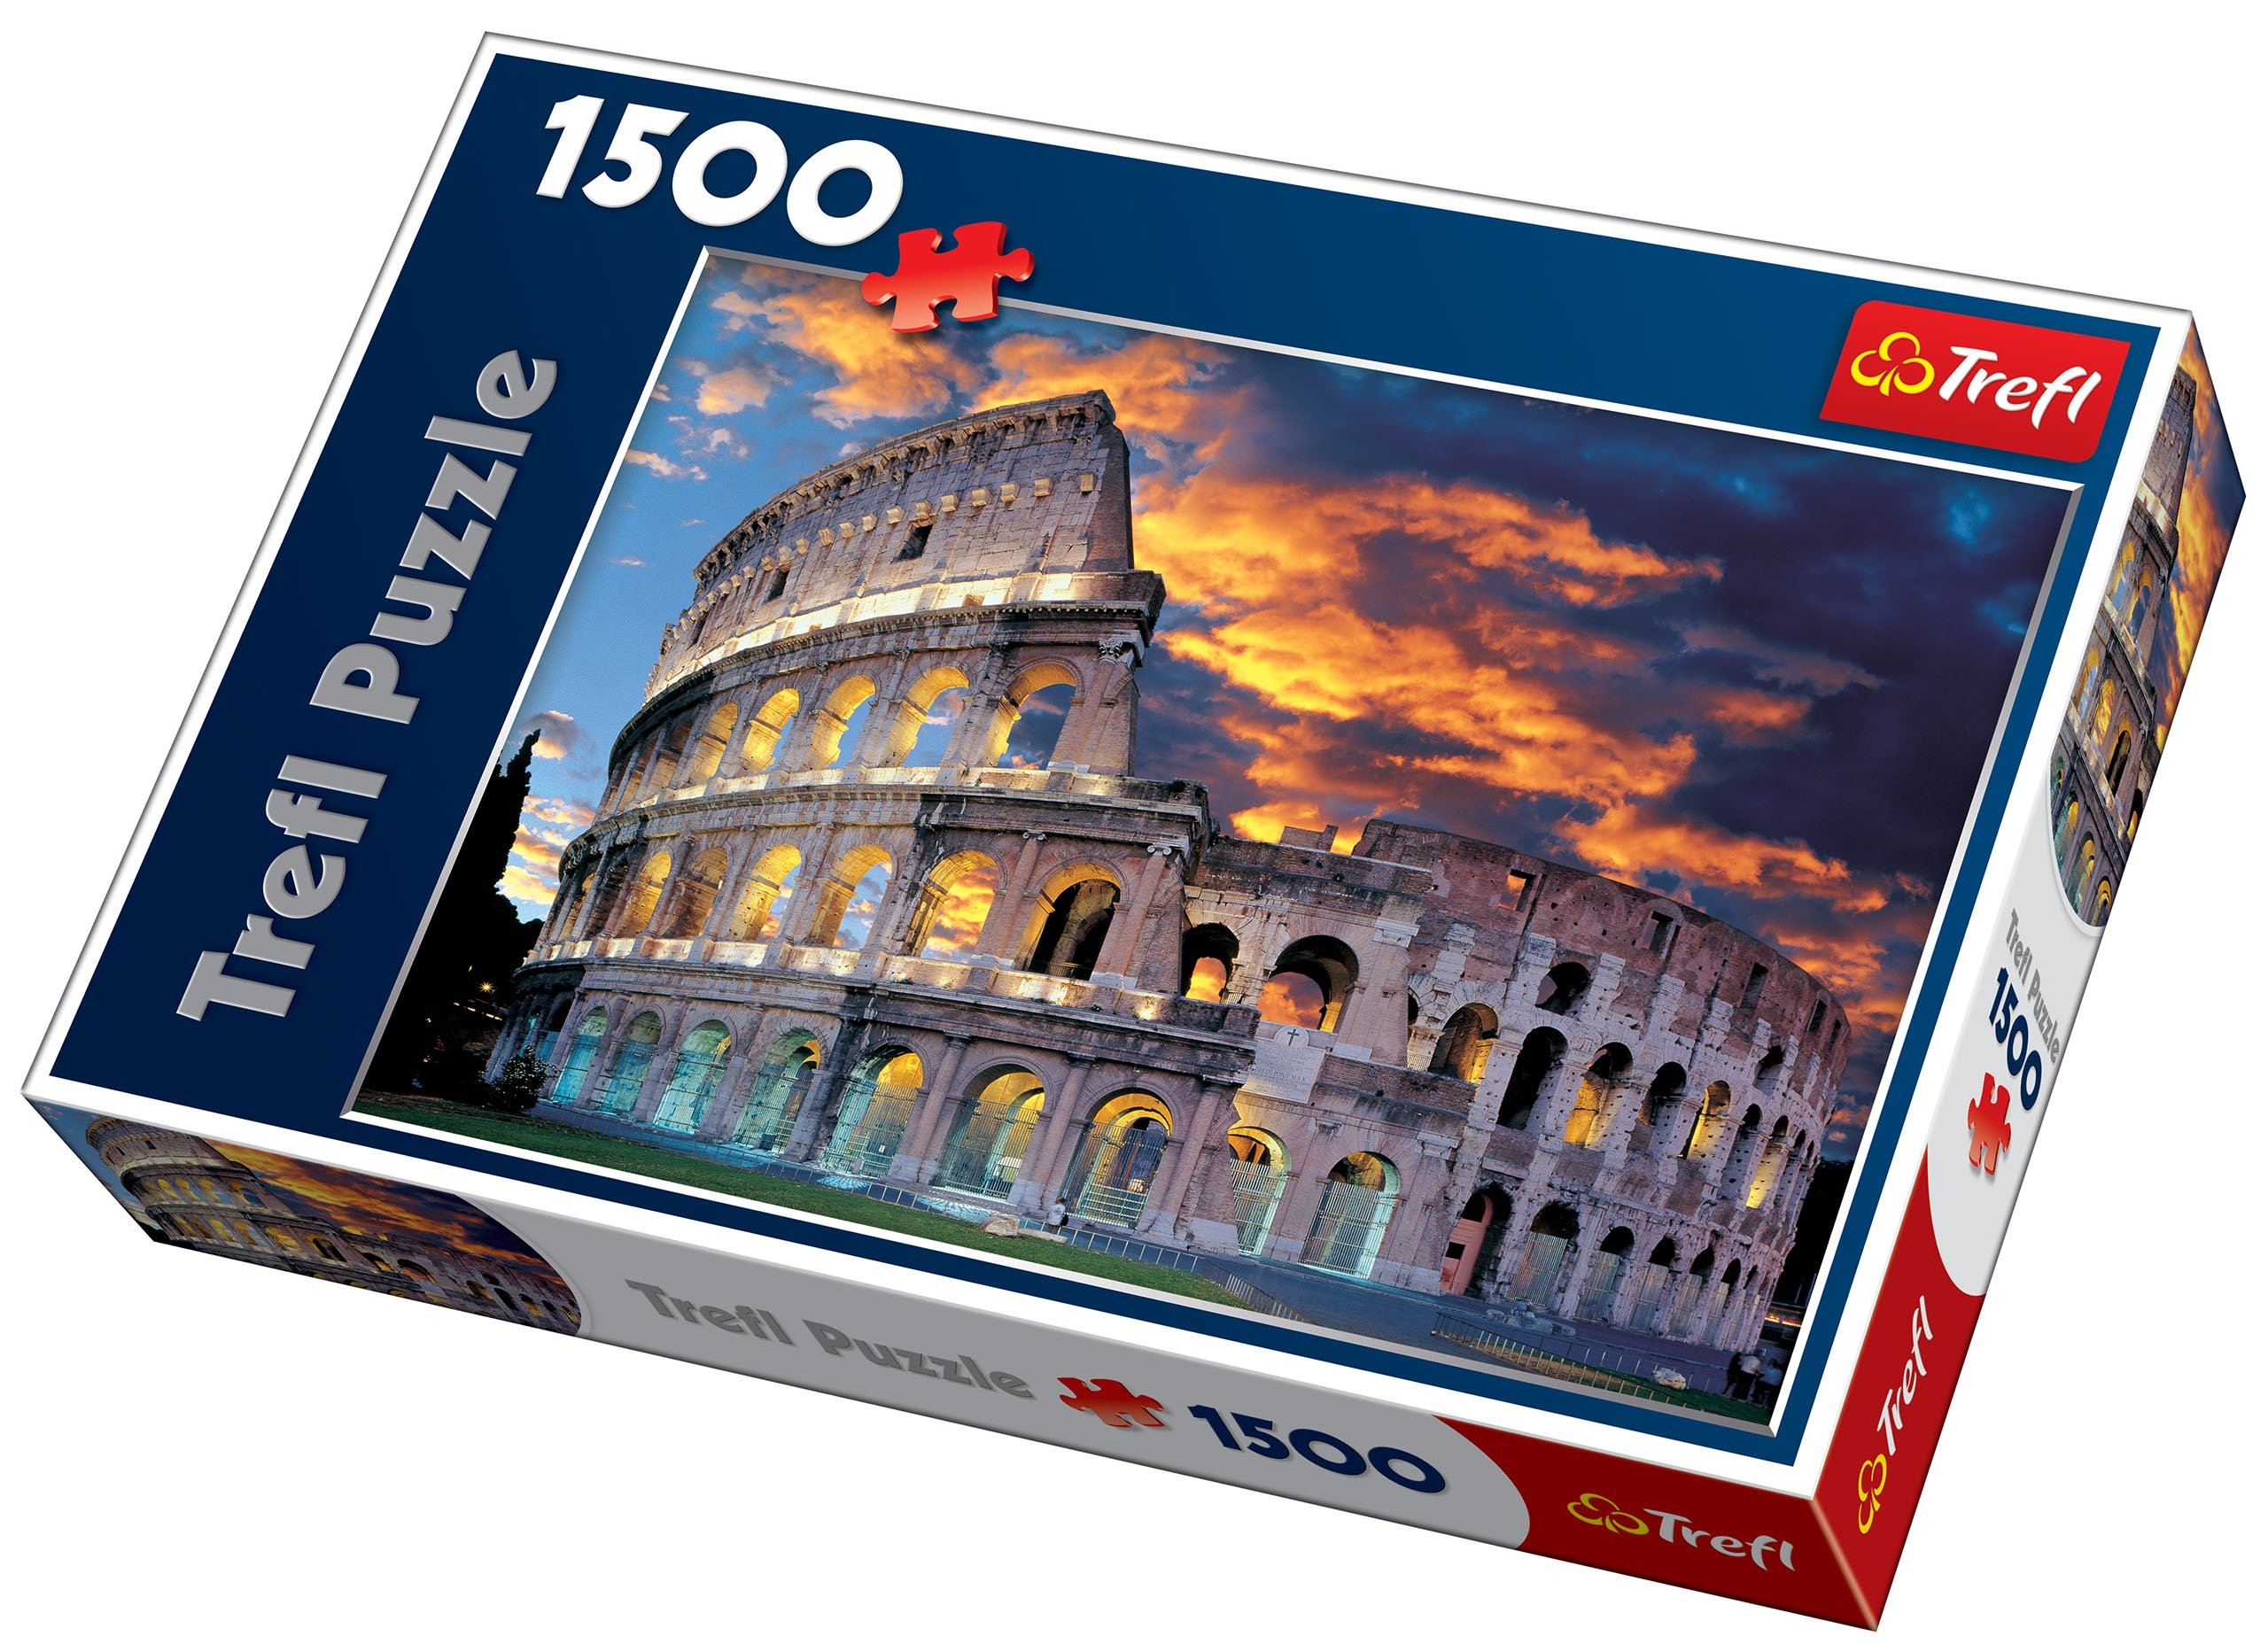 Trefl 1500 Piece Adult Large Rome Colosseum Theatre Floor